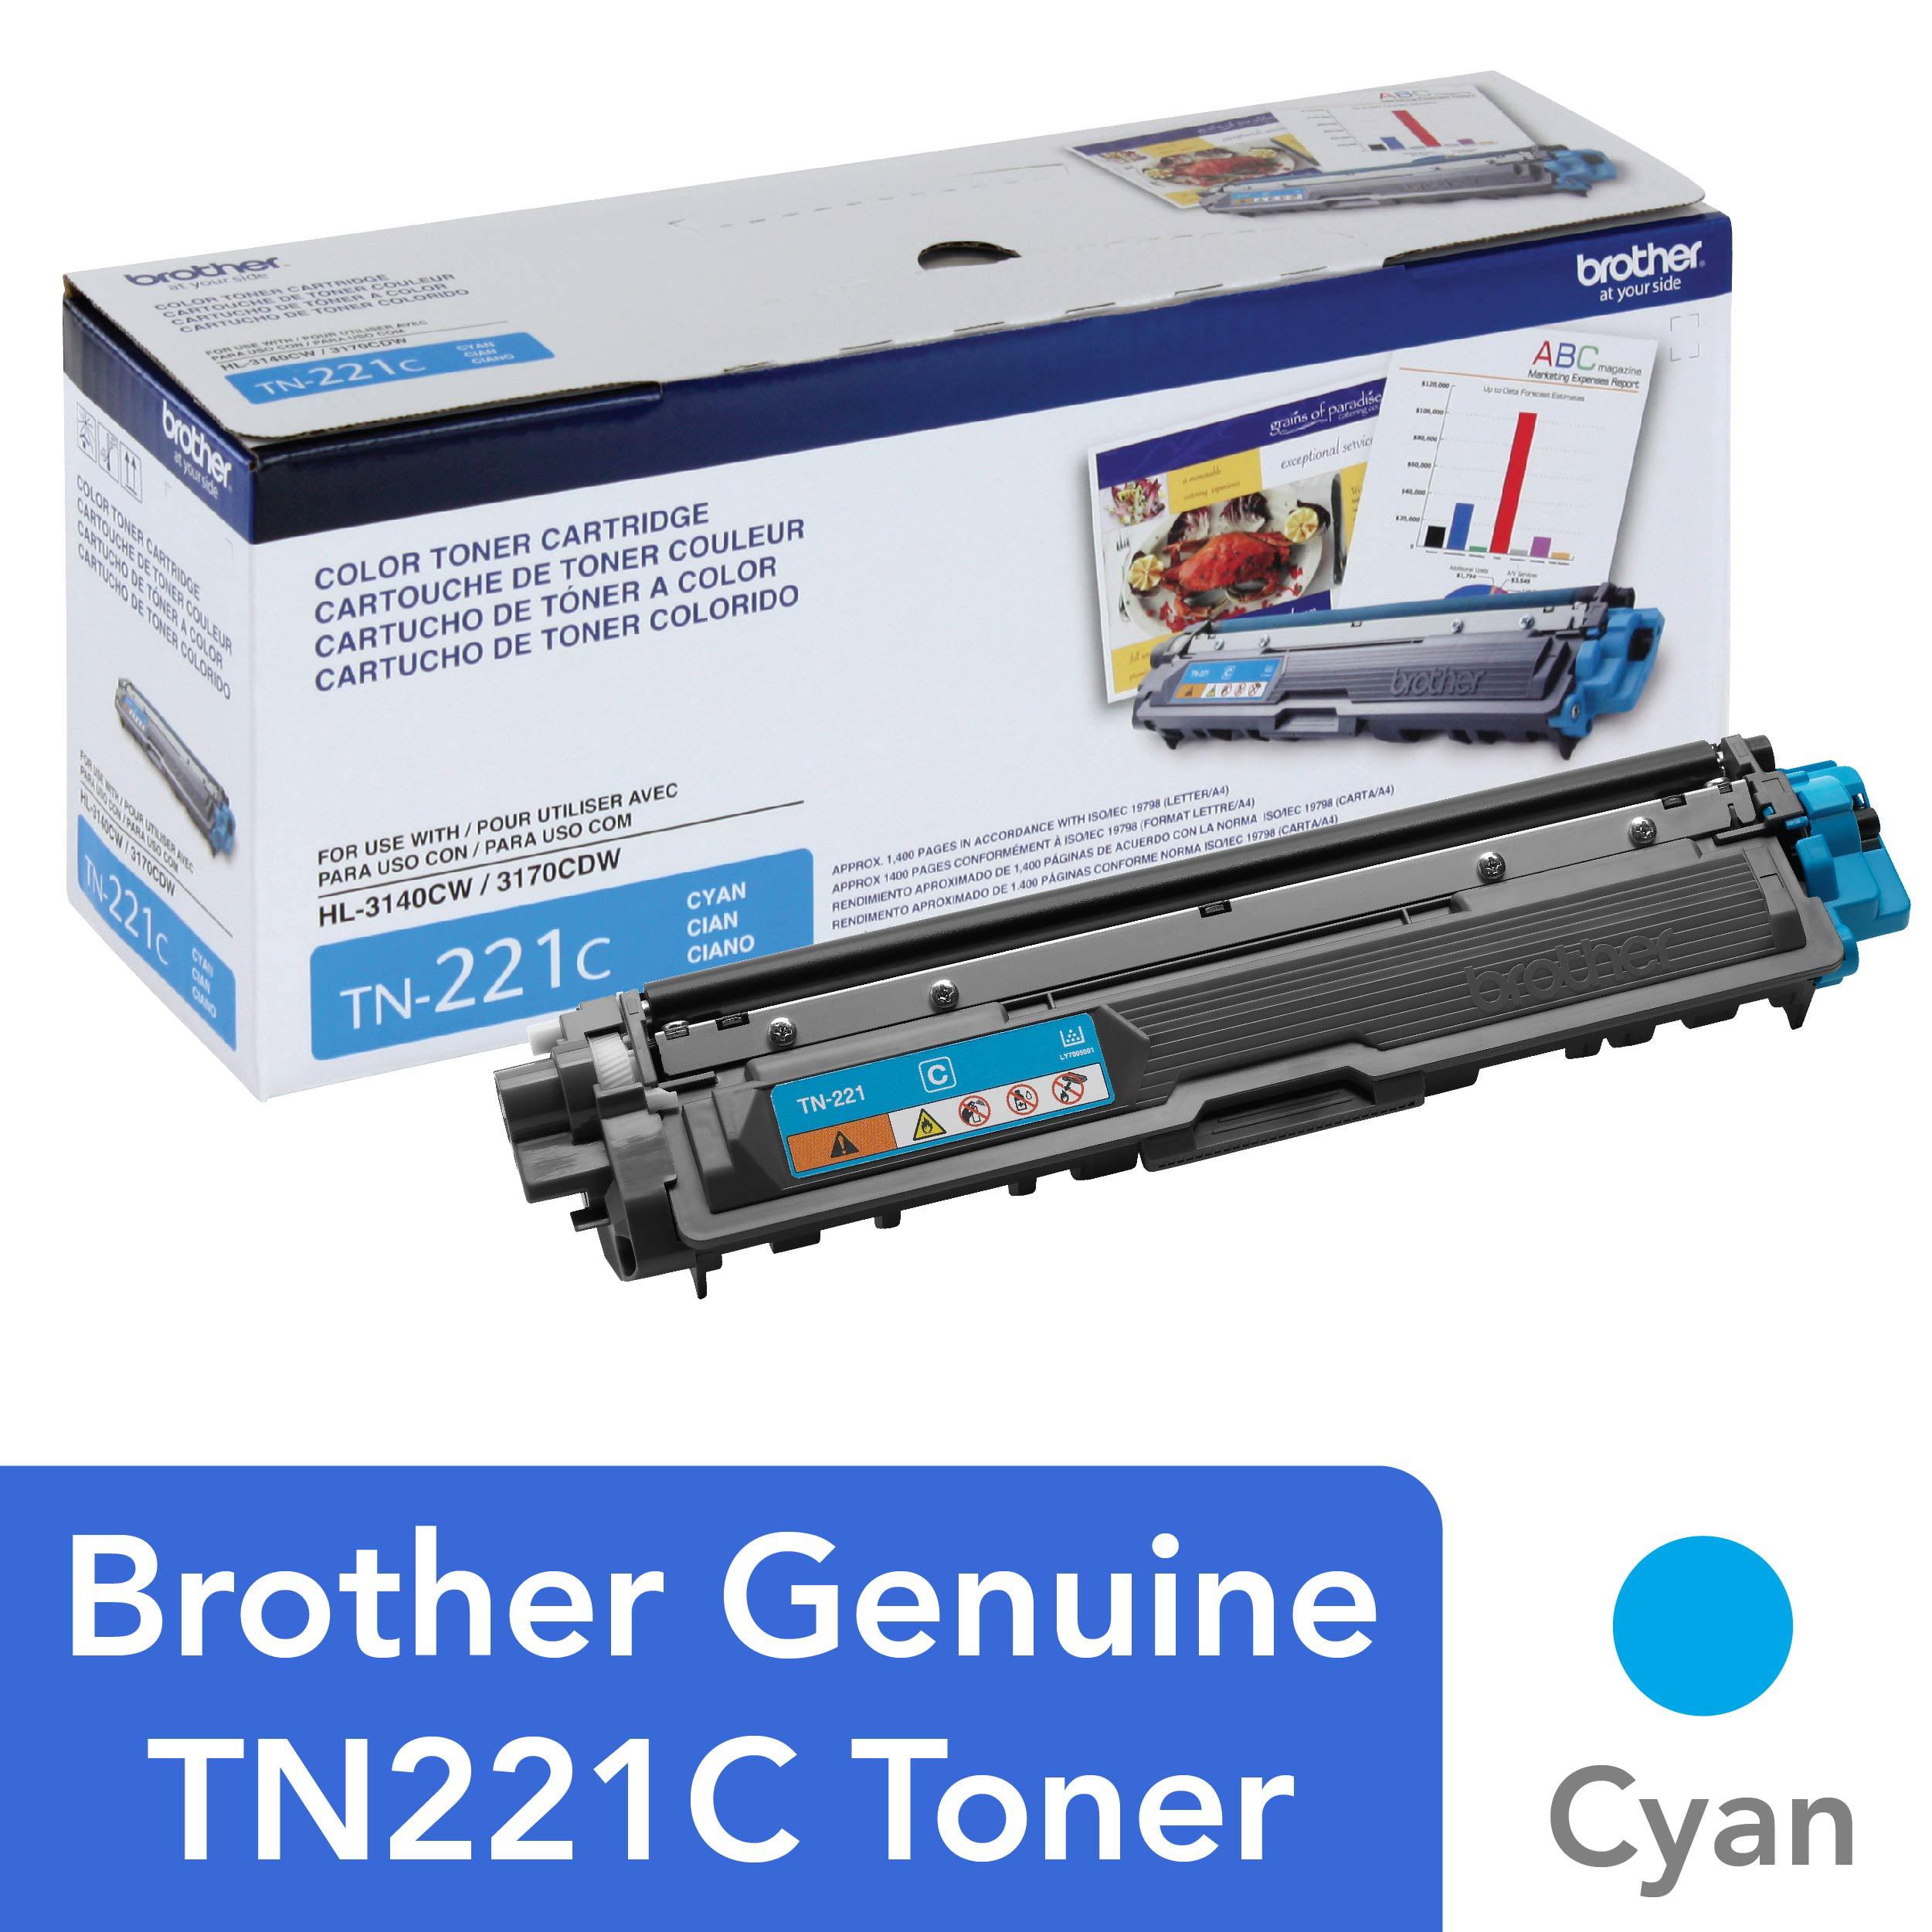 Brother 9340CDW Yellow Original Toner High Yield 2,200 Yield